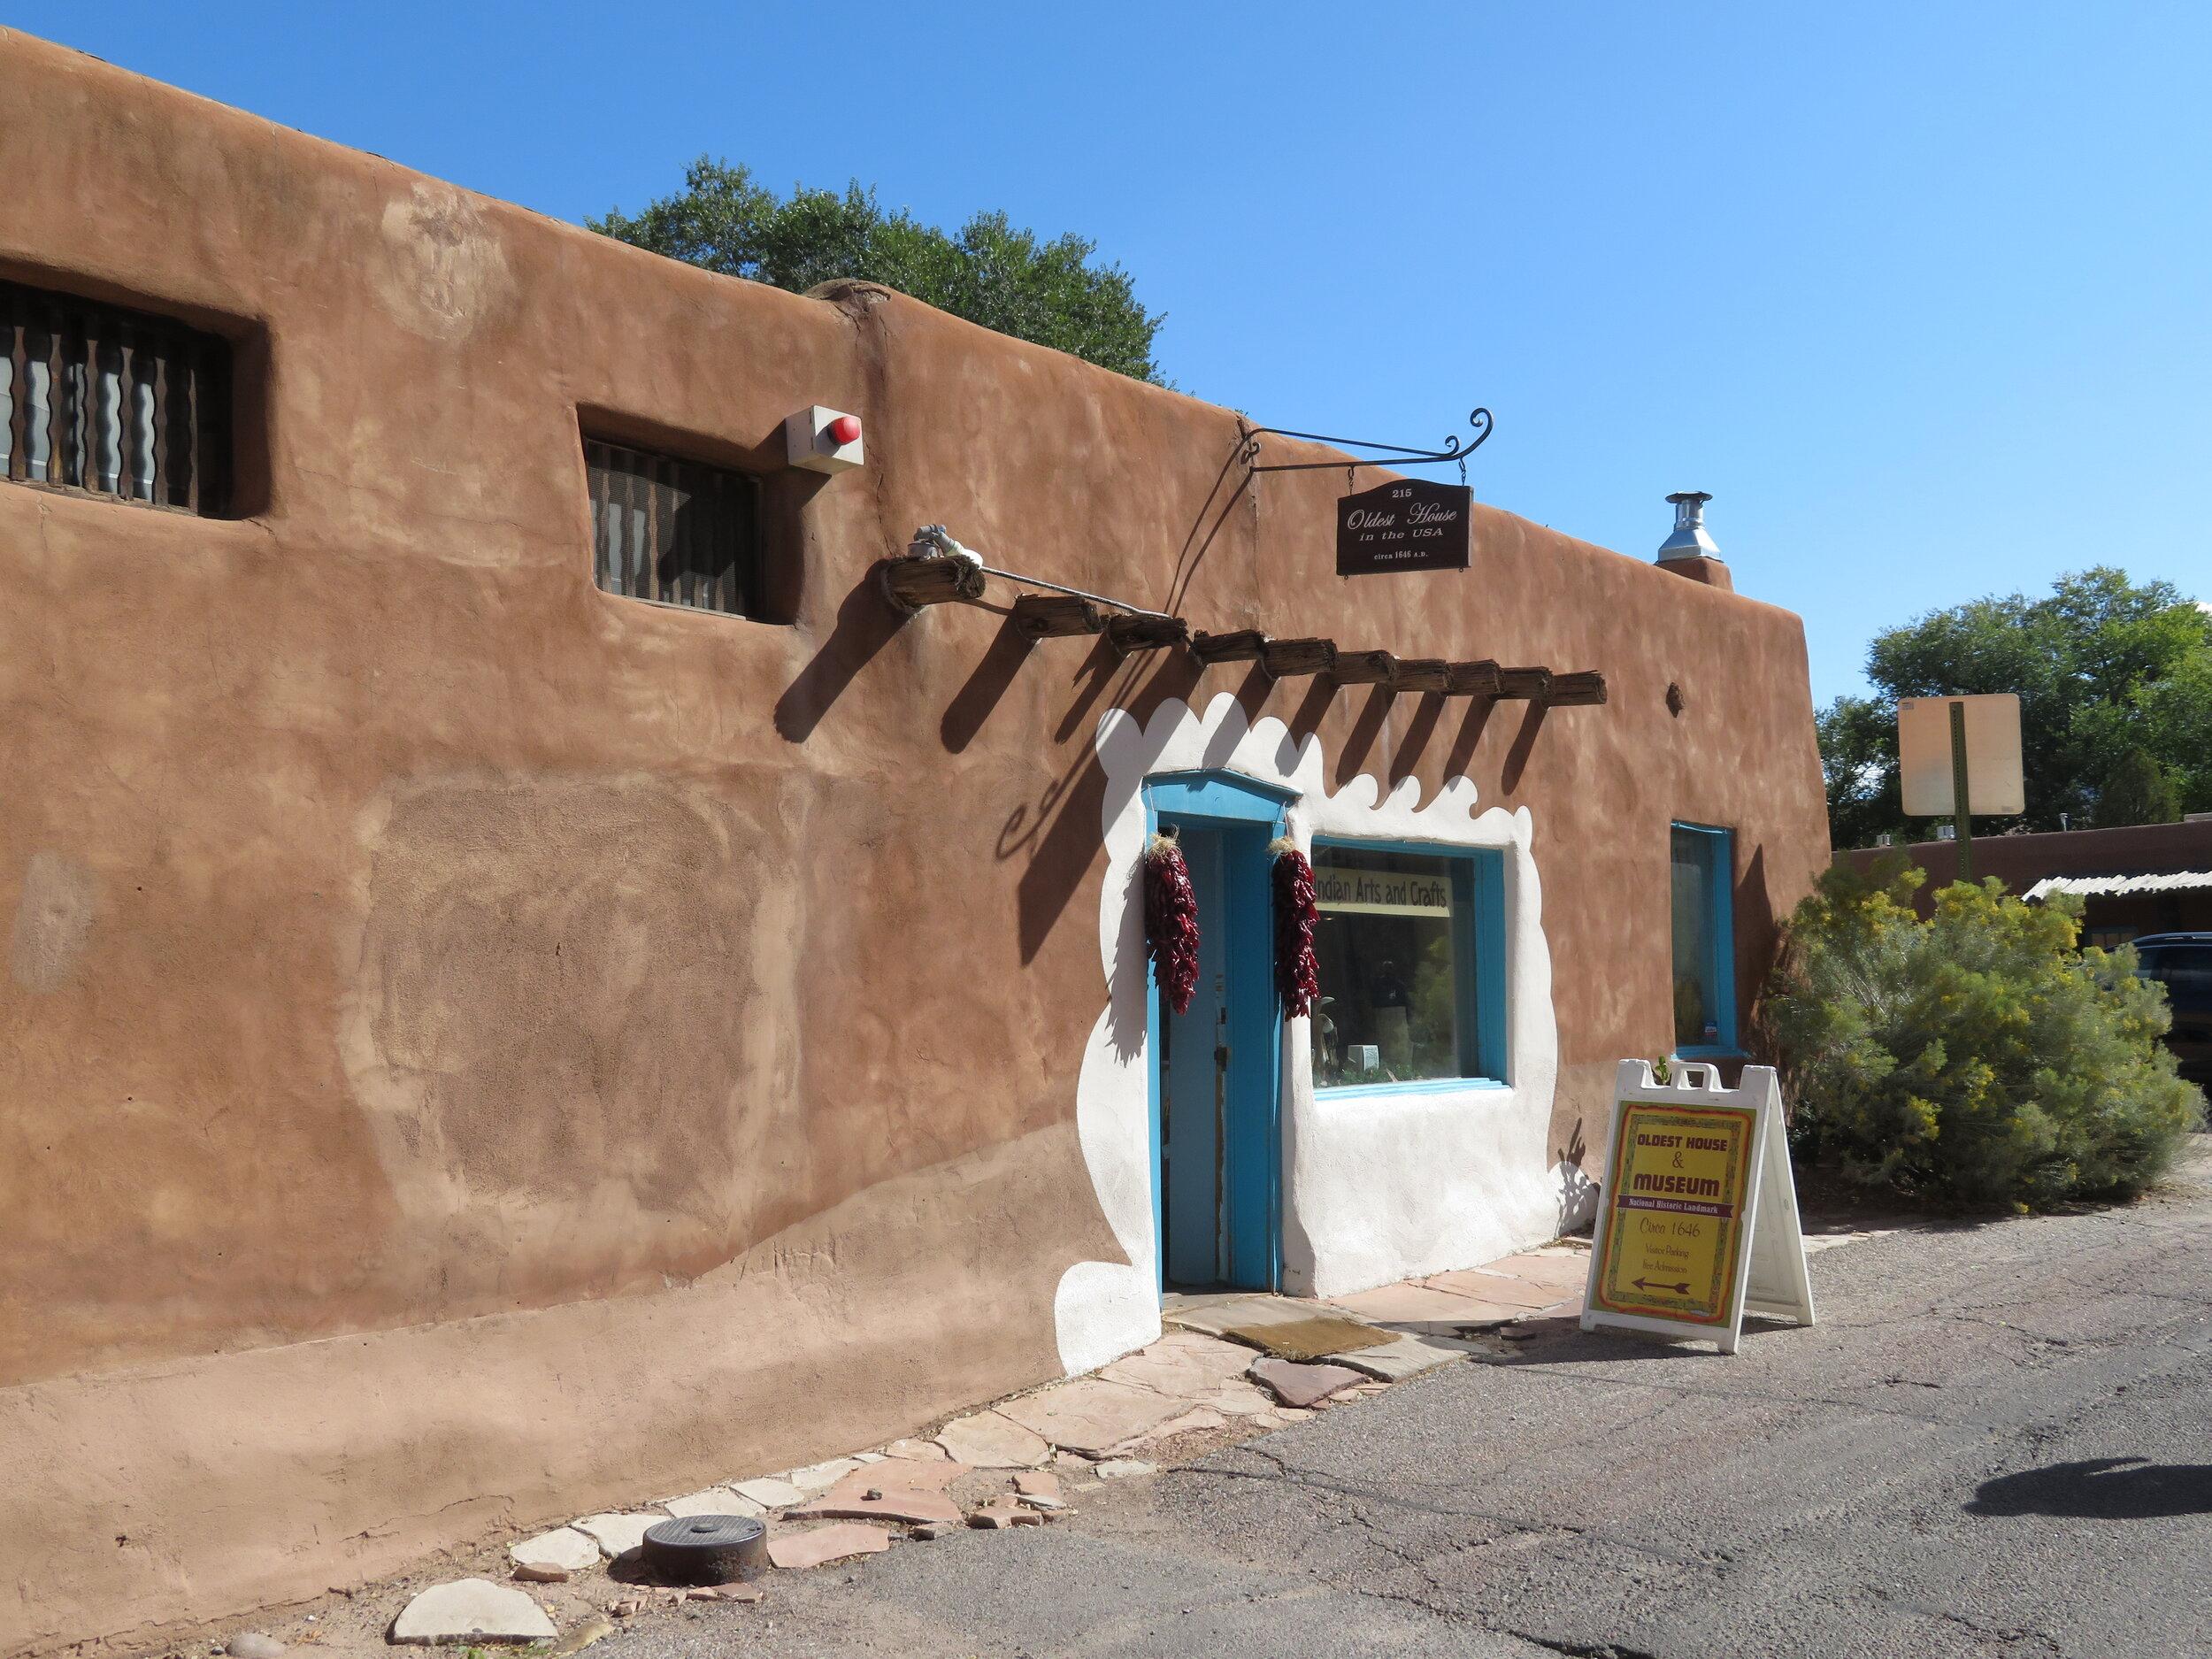 Oldest house in Santa Fe c. 1610